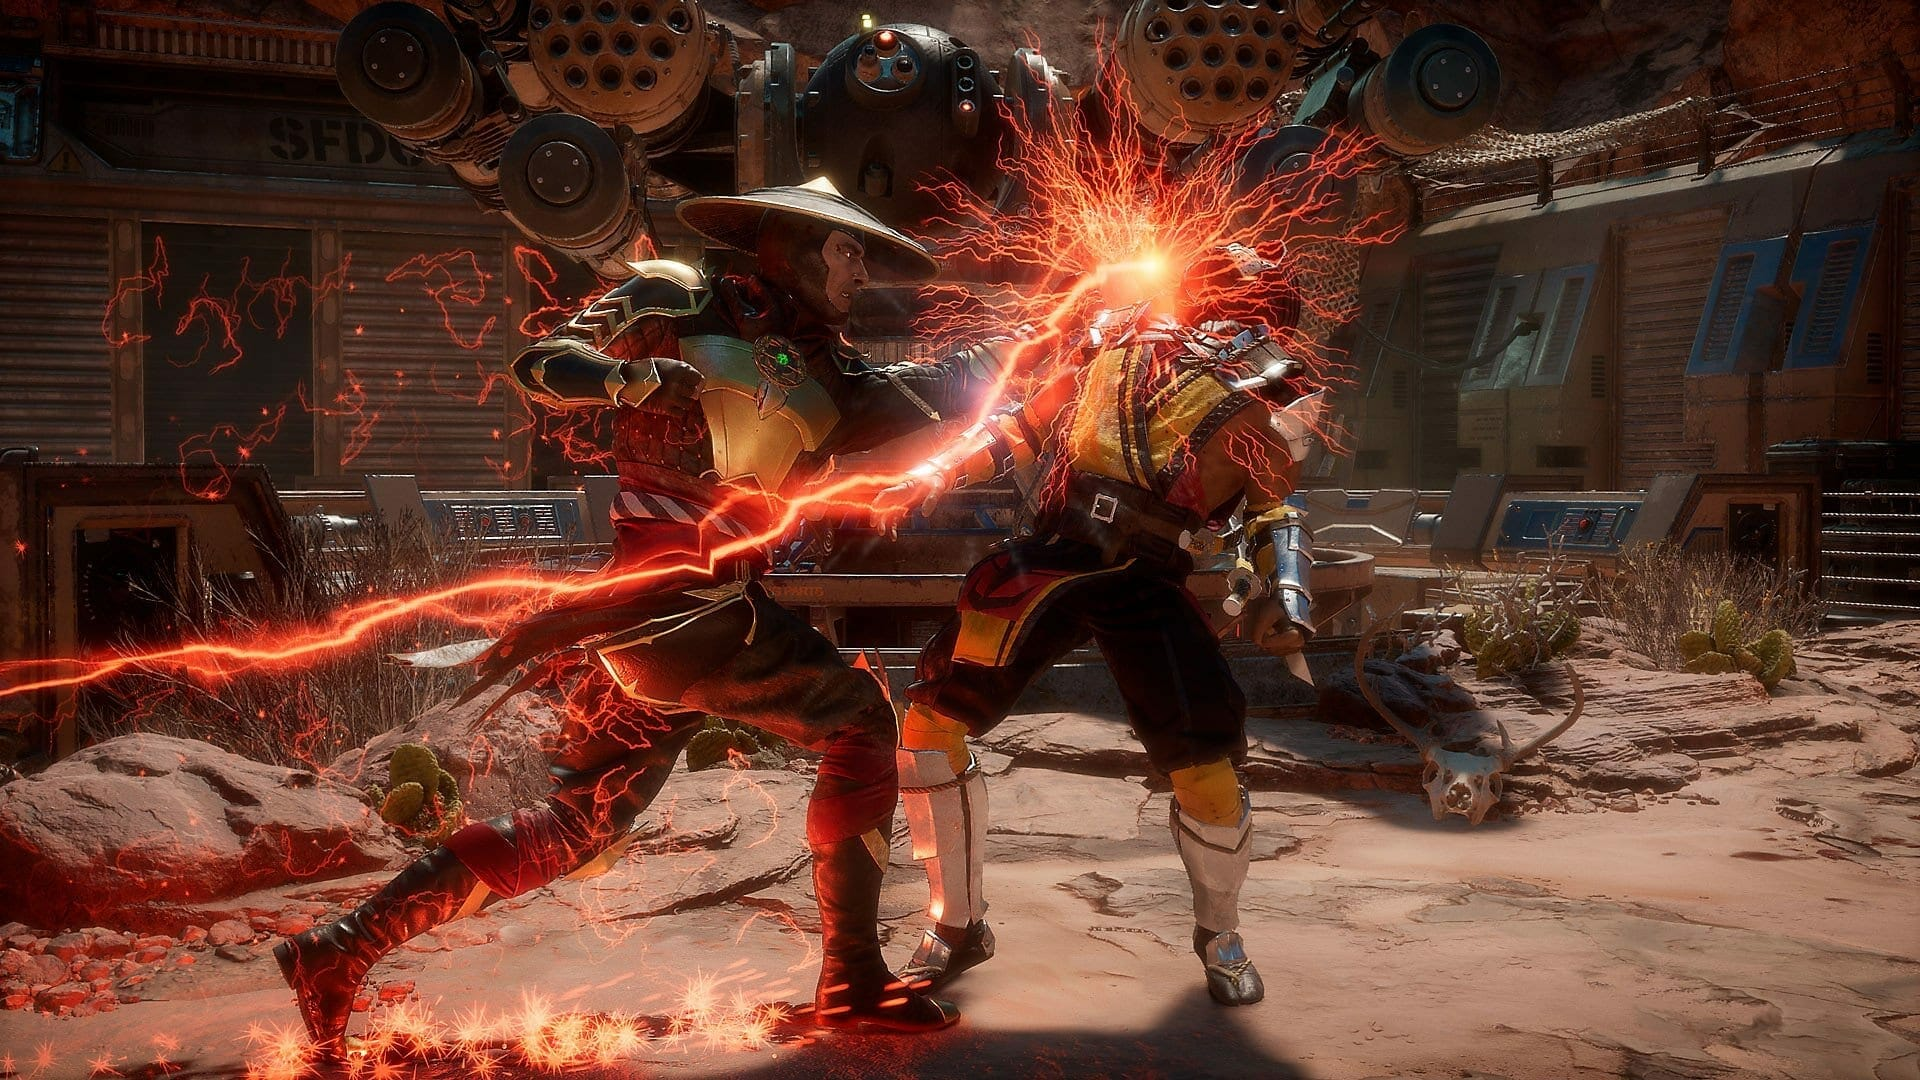 Mortal Kombat 11 stutter issue